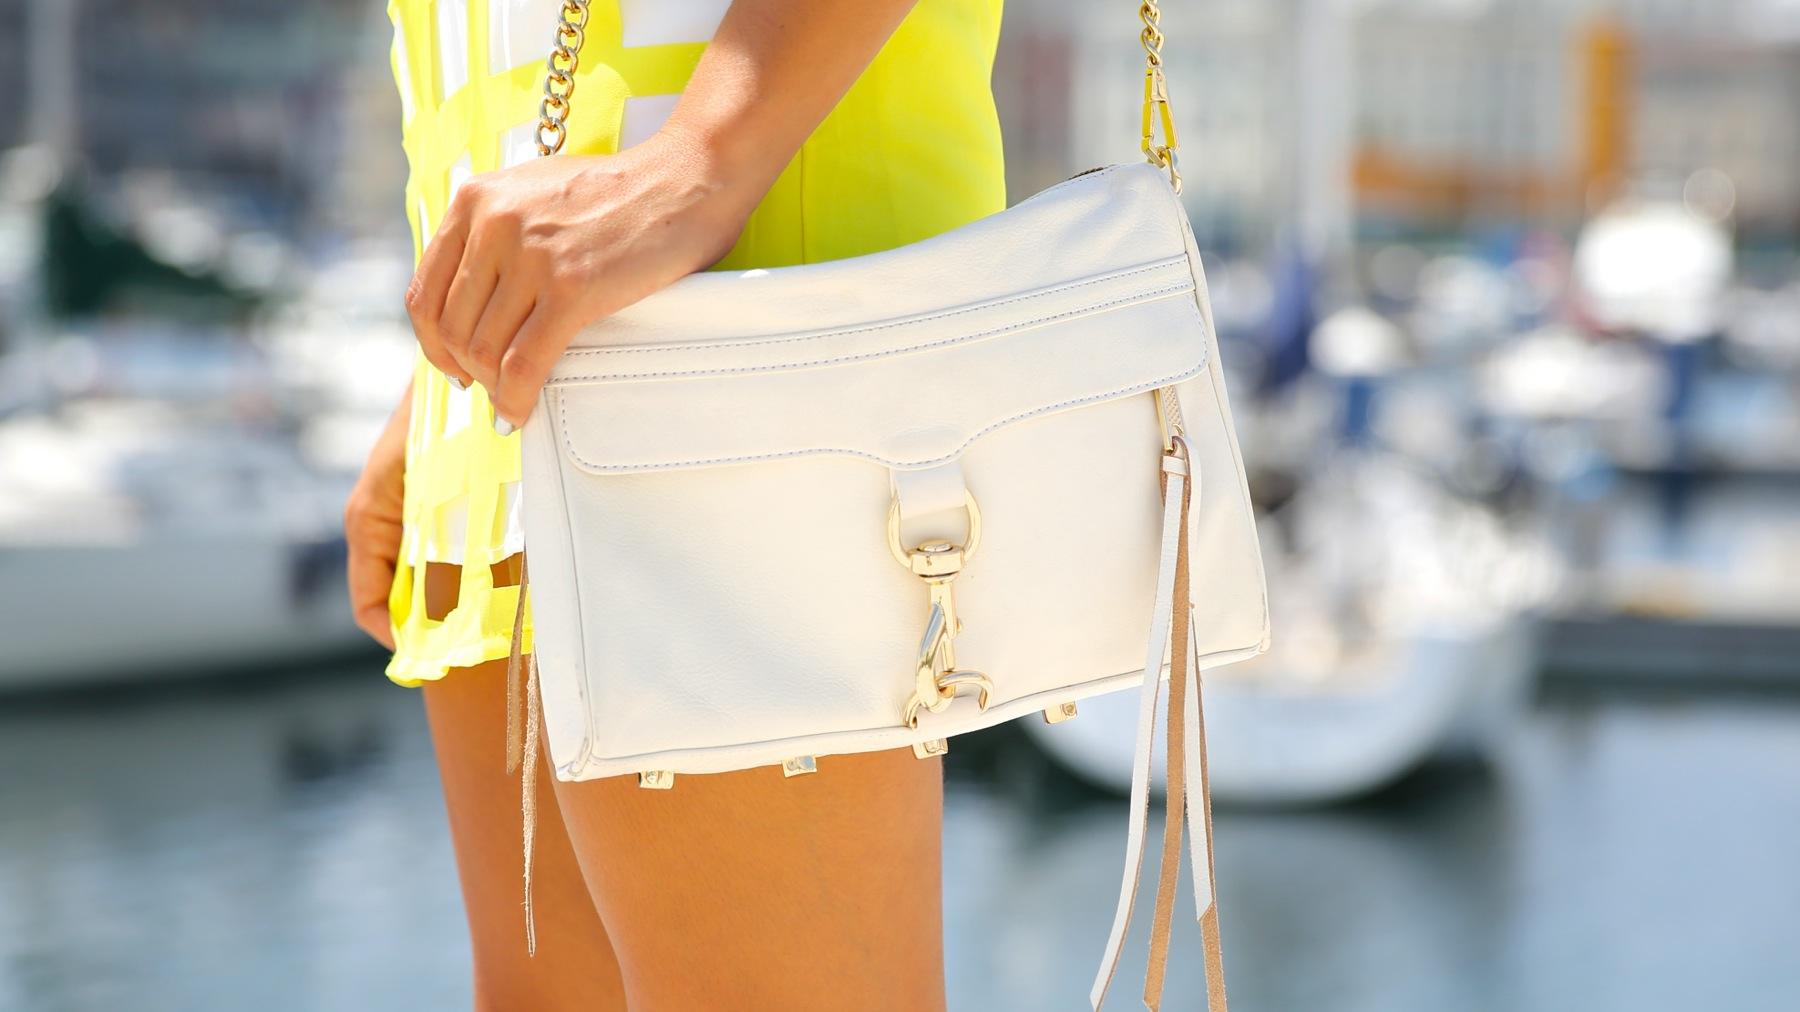 trendy_taste-look-outfit-street_style-ootd-blog-blogger-moda_españa-fashion_spain-coruña-galicia-sandalias_plataforma-platform_sandals-rebecca_minkoff-yellow-amarillo-vestido-dress-plaid-cuadros-2